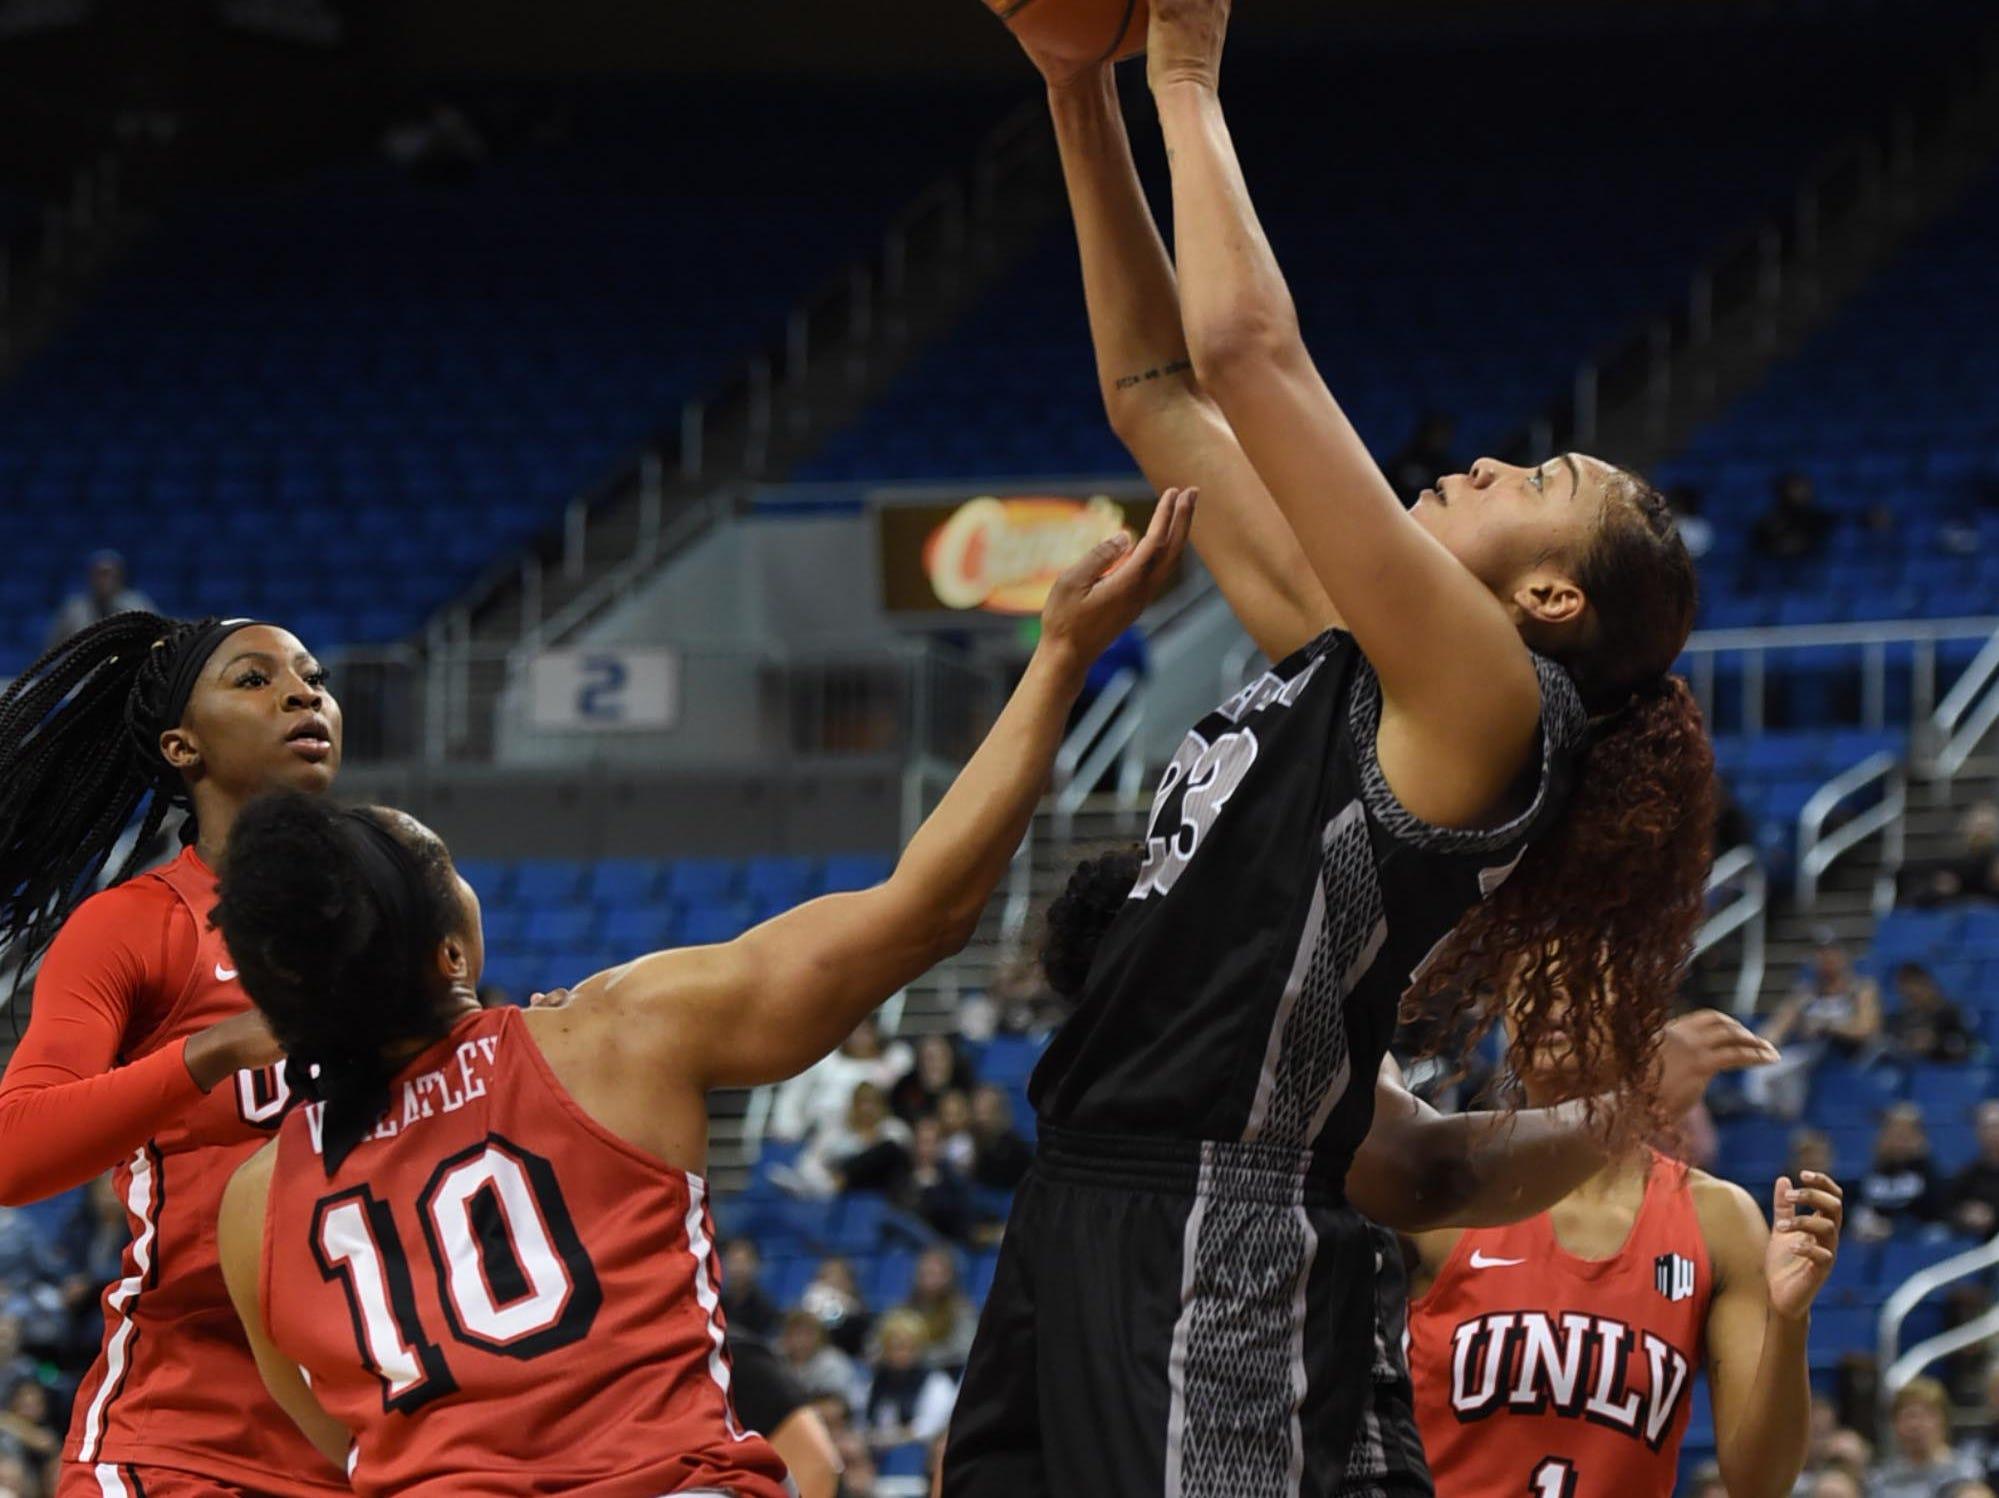 Photos of Nevada Women defeating UNLV